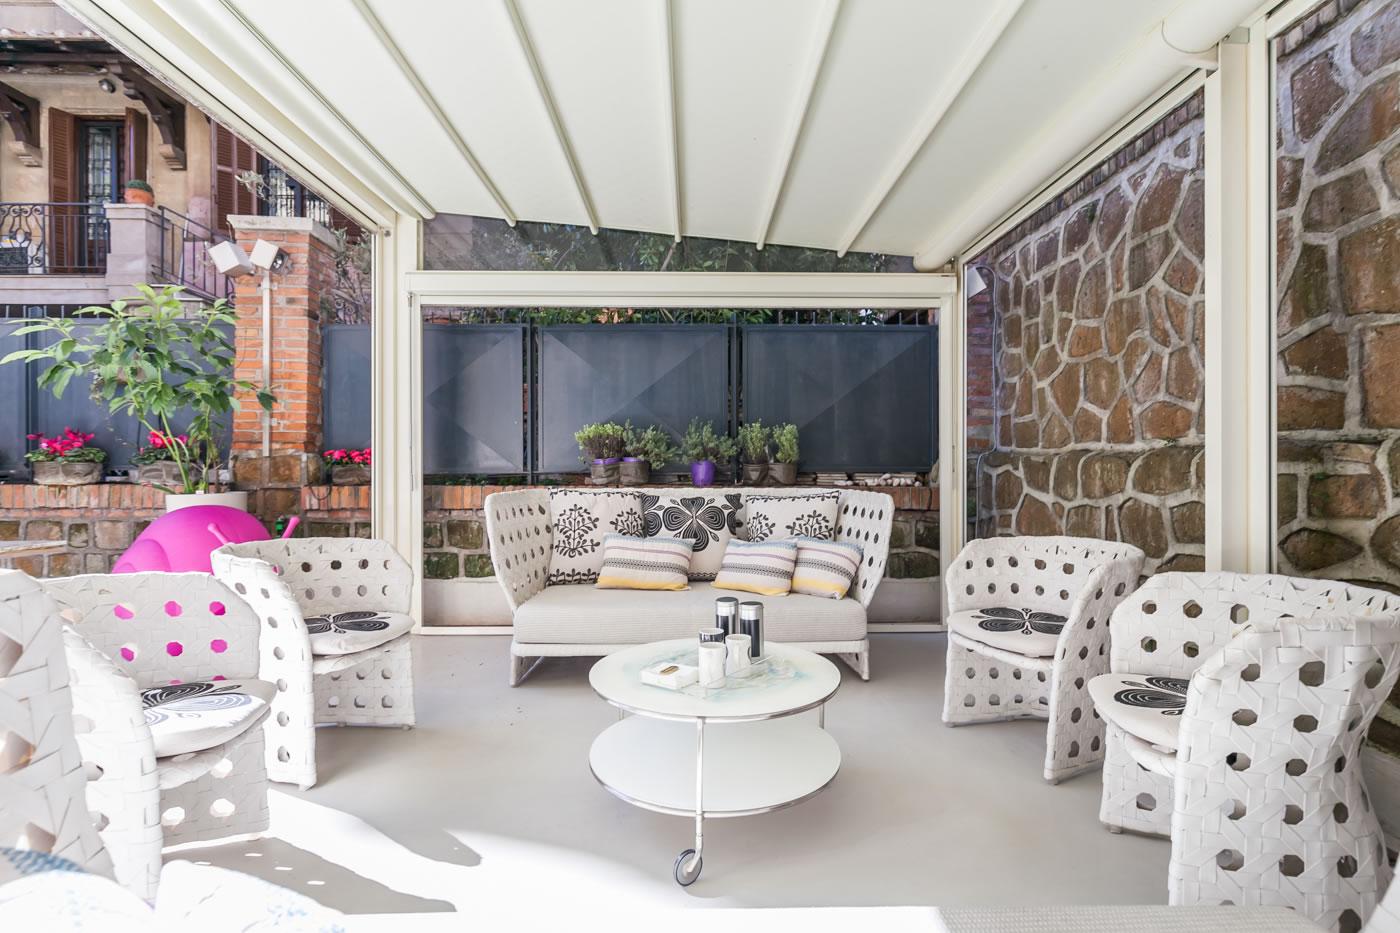 home office for sale in rome maria laura berlinguer stile italiano. Black Bedroom Furniture Sets. Home Design Ideas